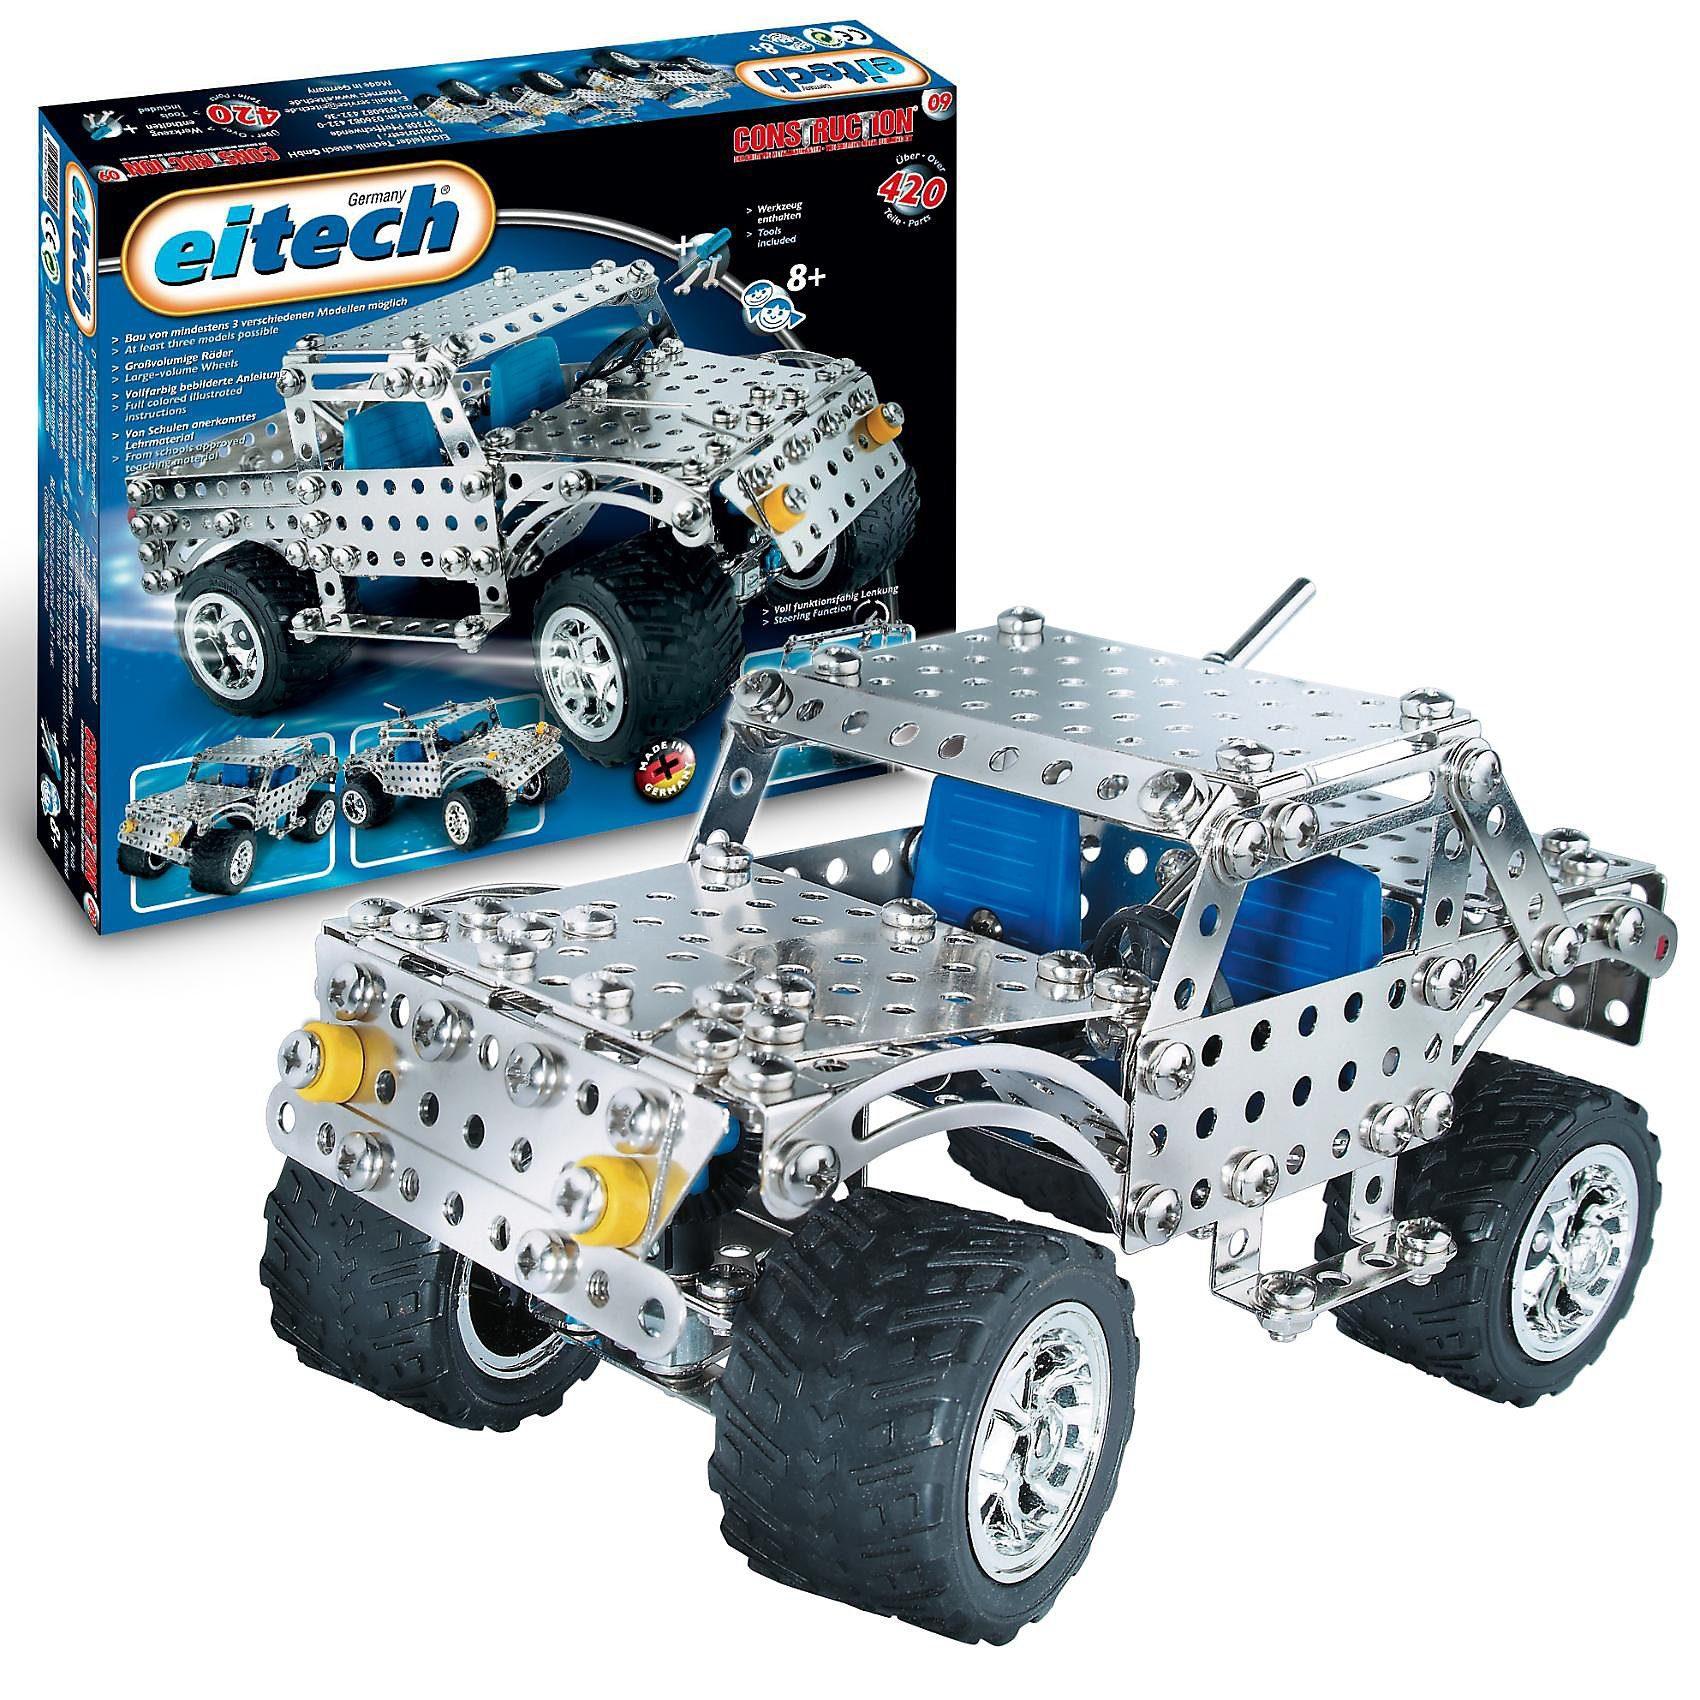 "Eitech C 09 KLASSIKER Metallbaukasten - ""Jeep"""